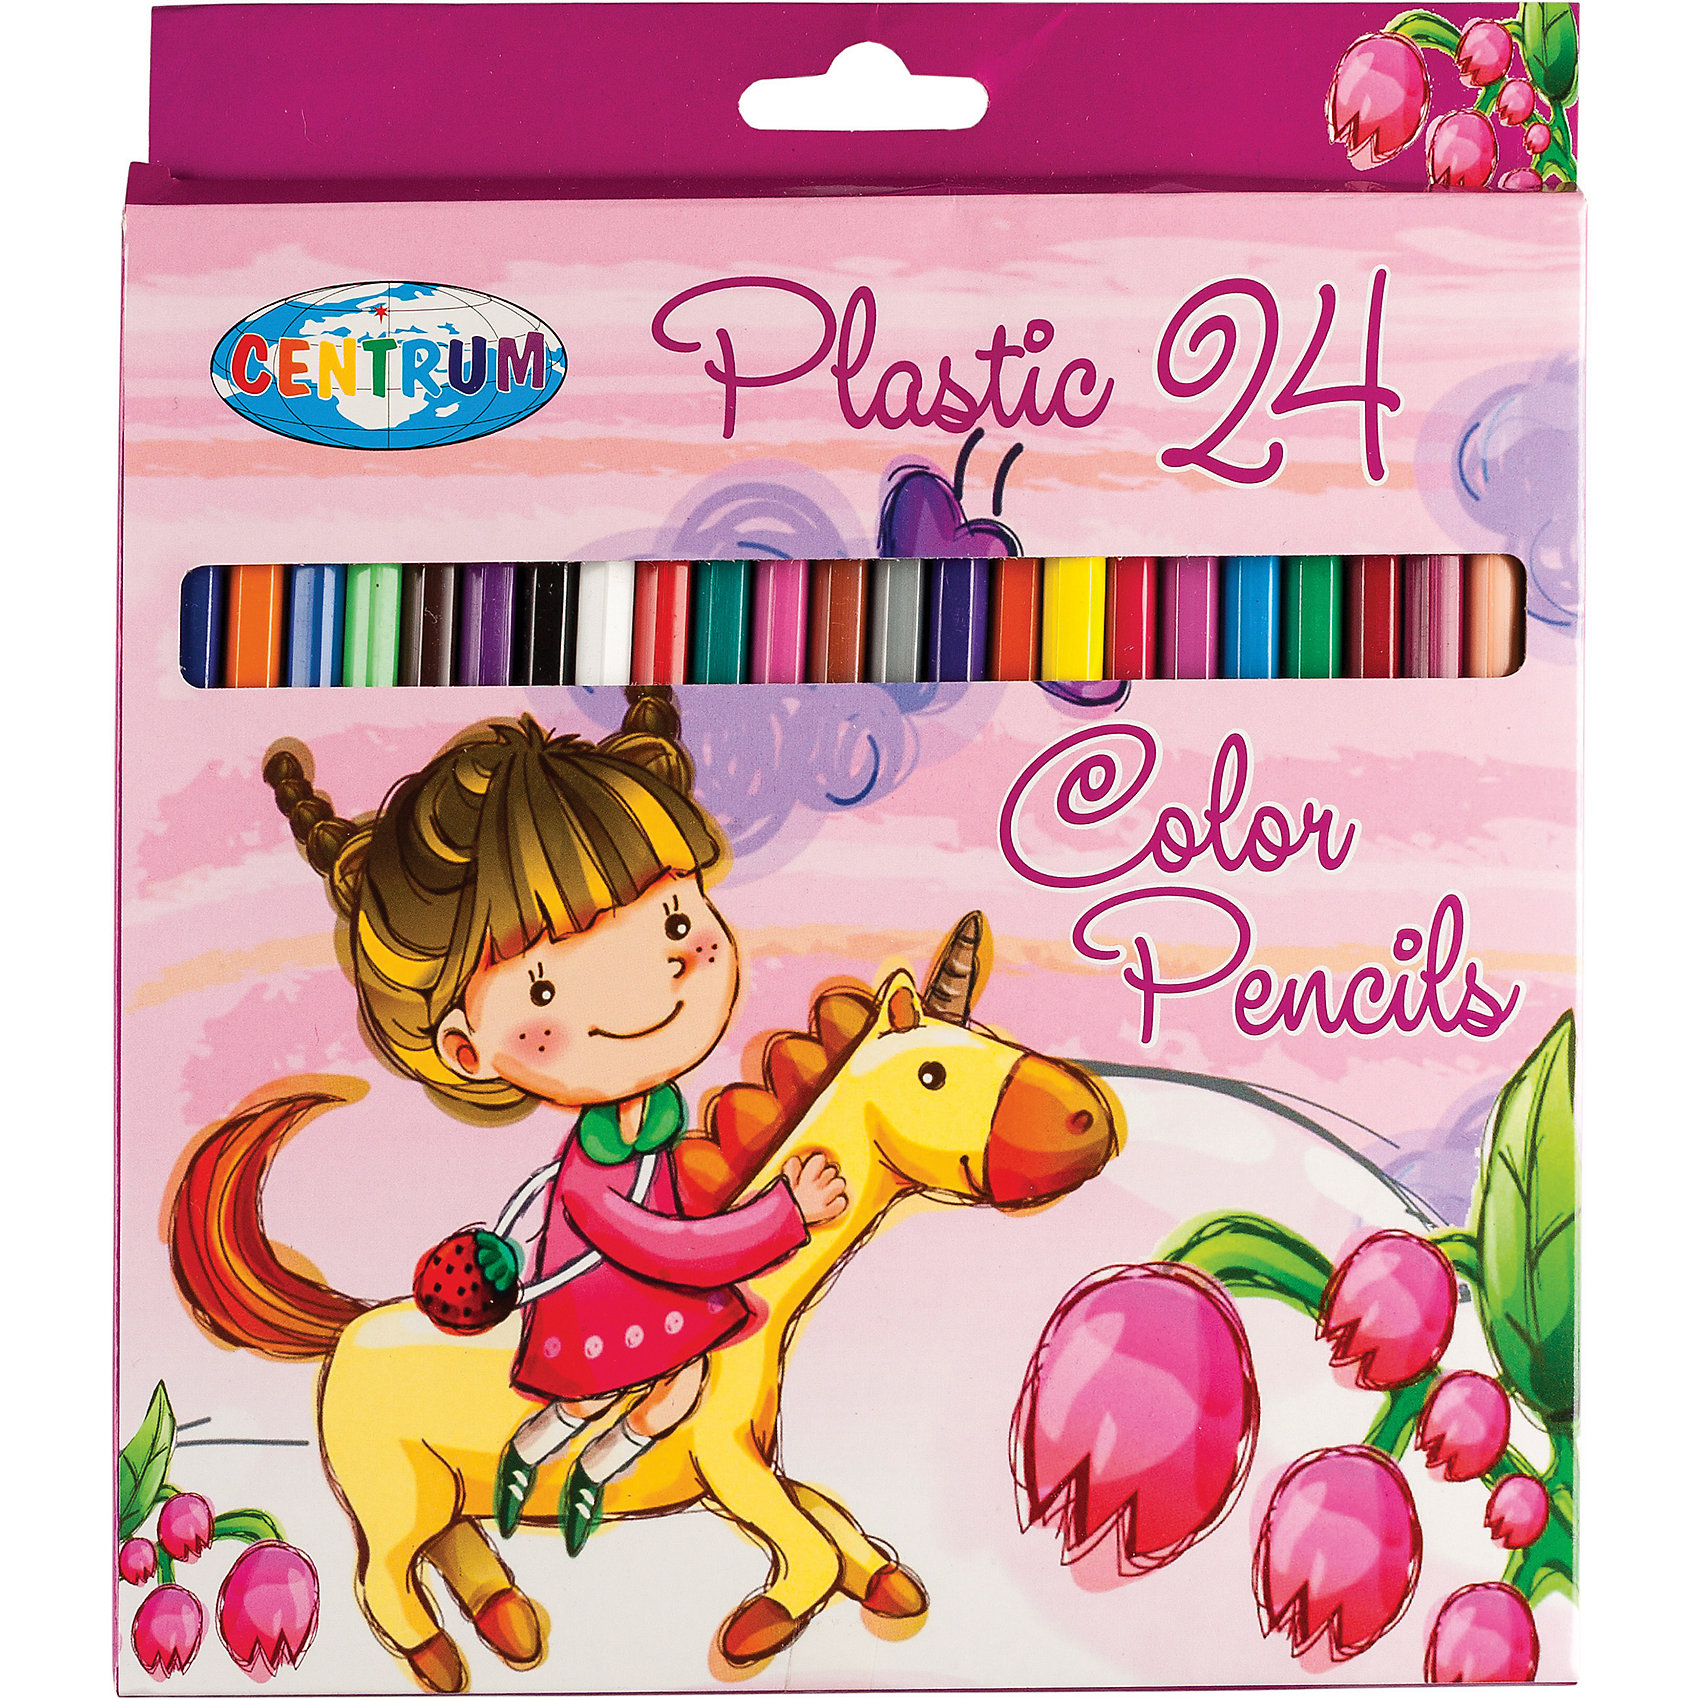 CENTRUM Цветные карандаши Единорог, 24 цвета карандаши джунгли 24 цвета tz 4028